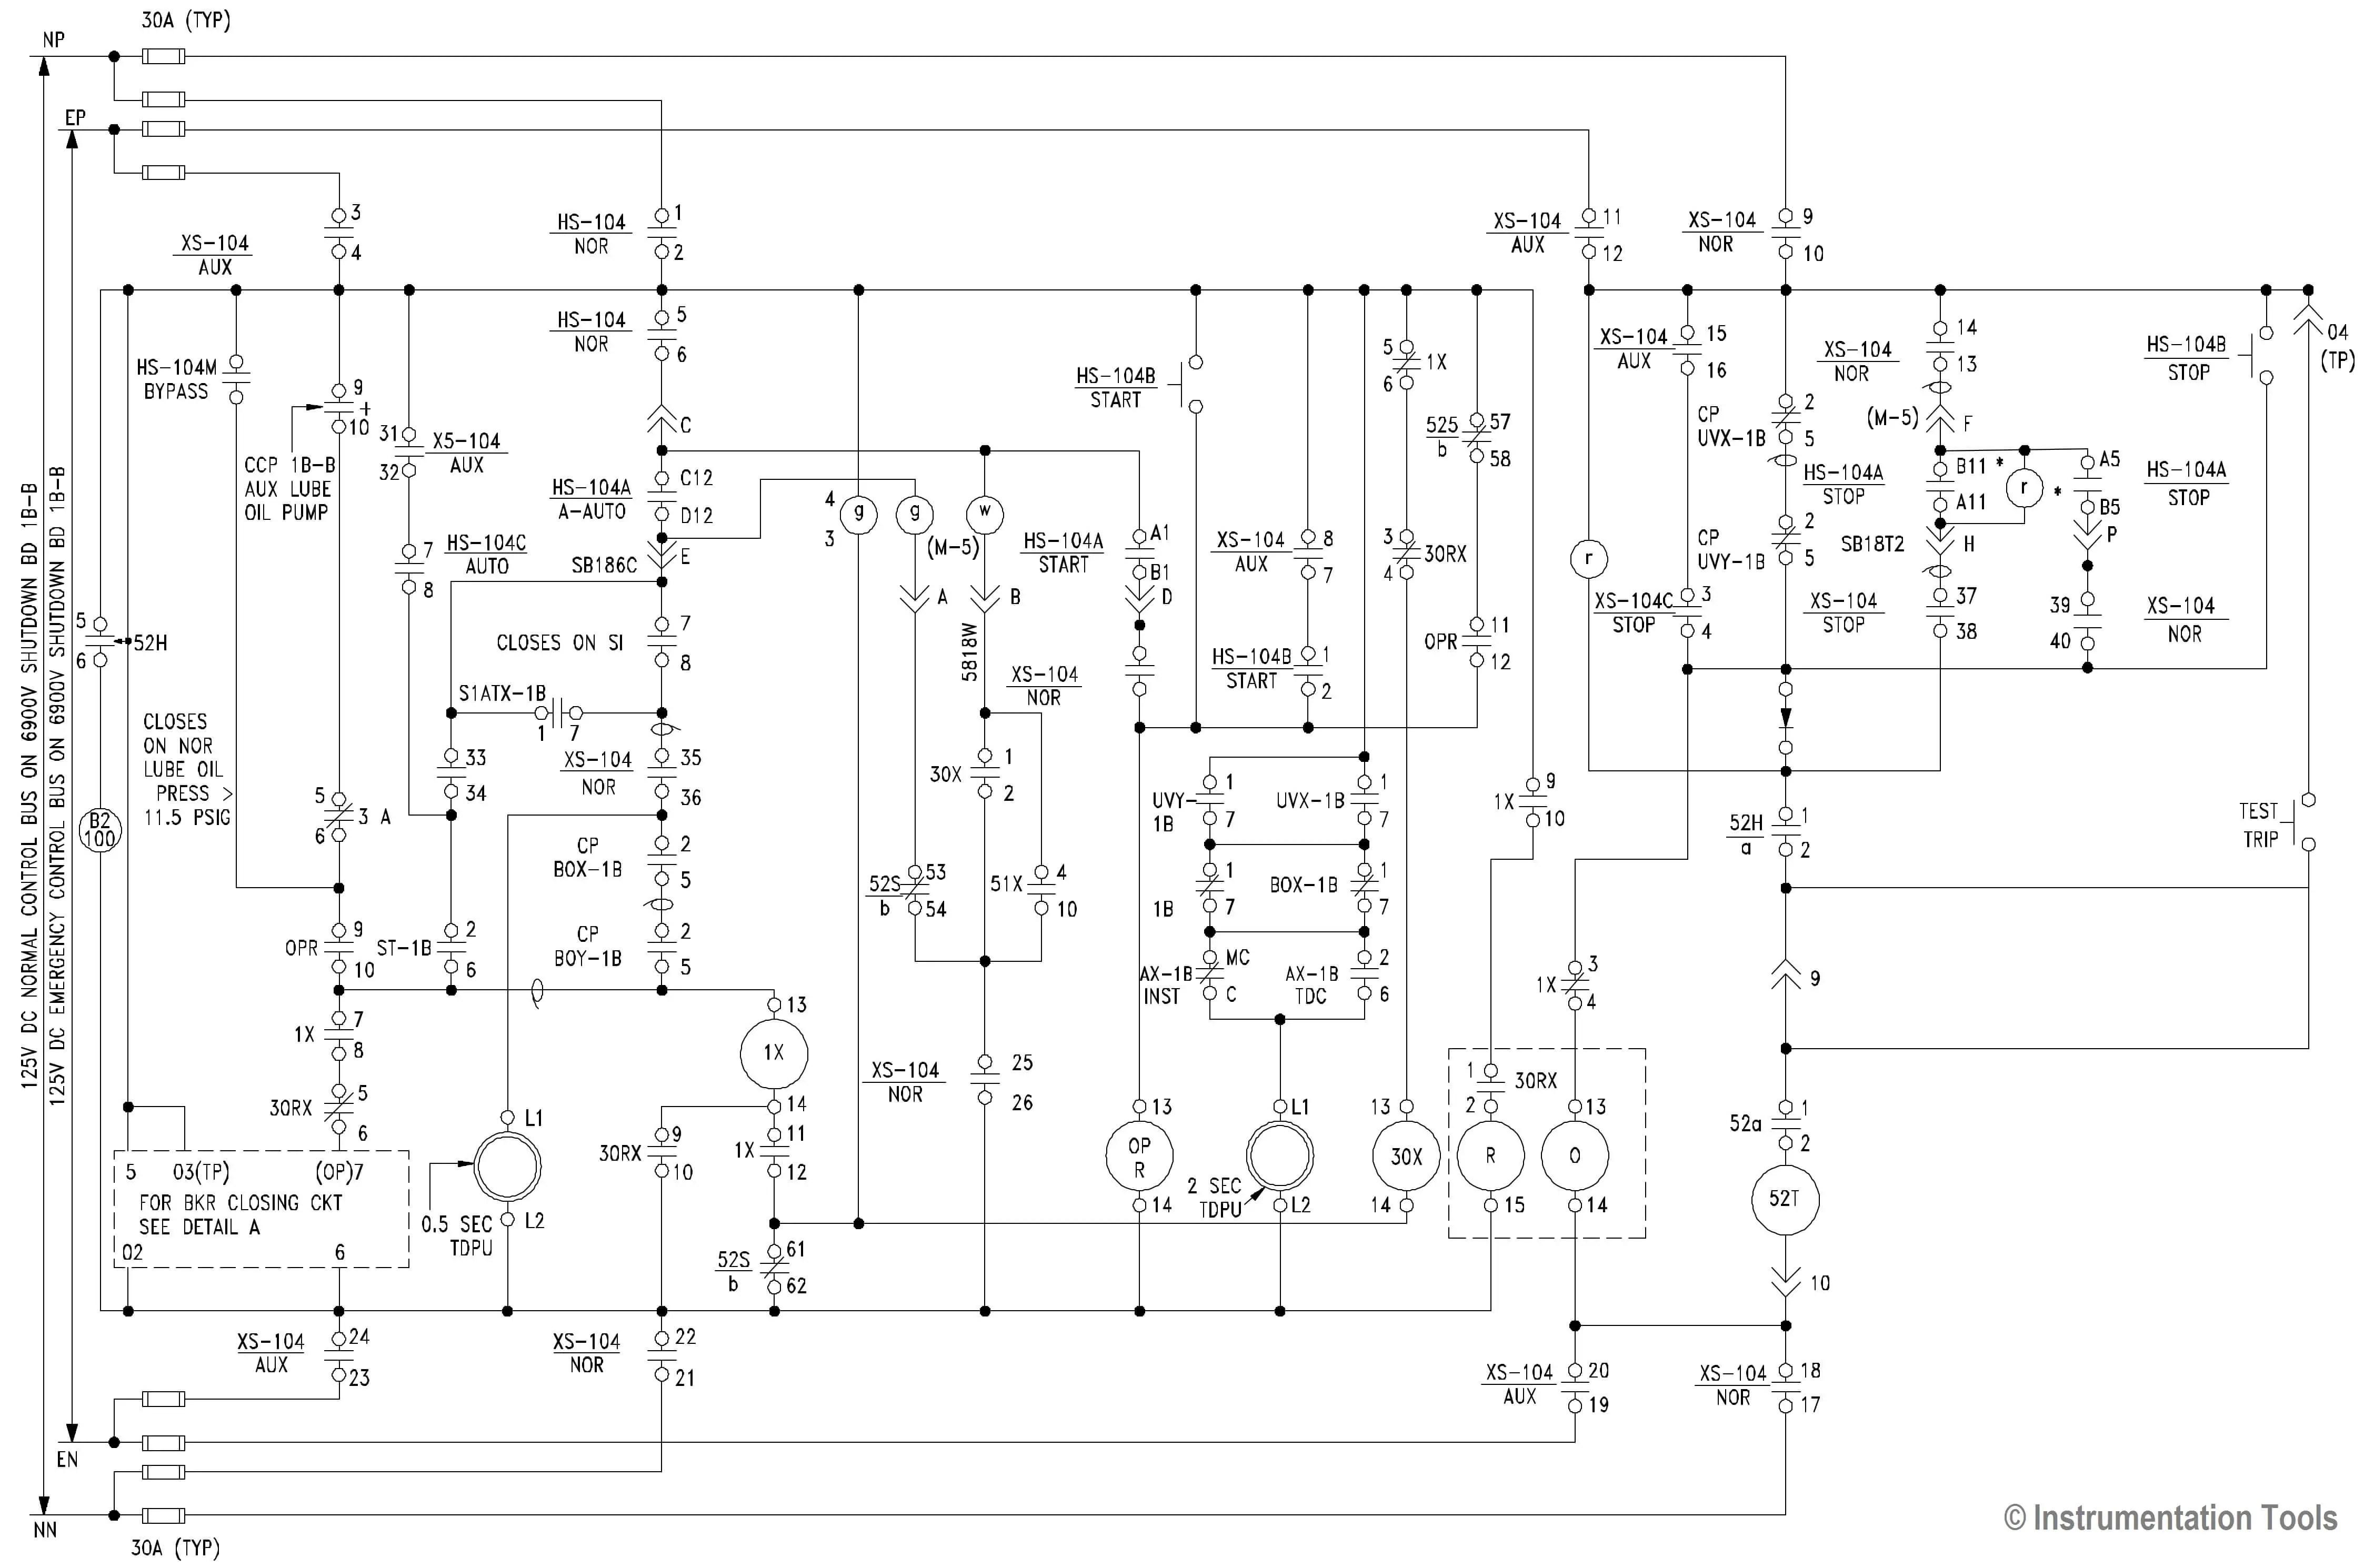 Engineering Logic Diagrams